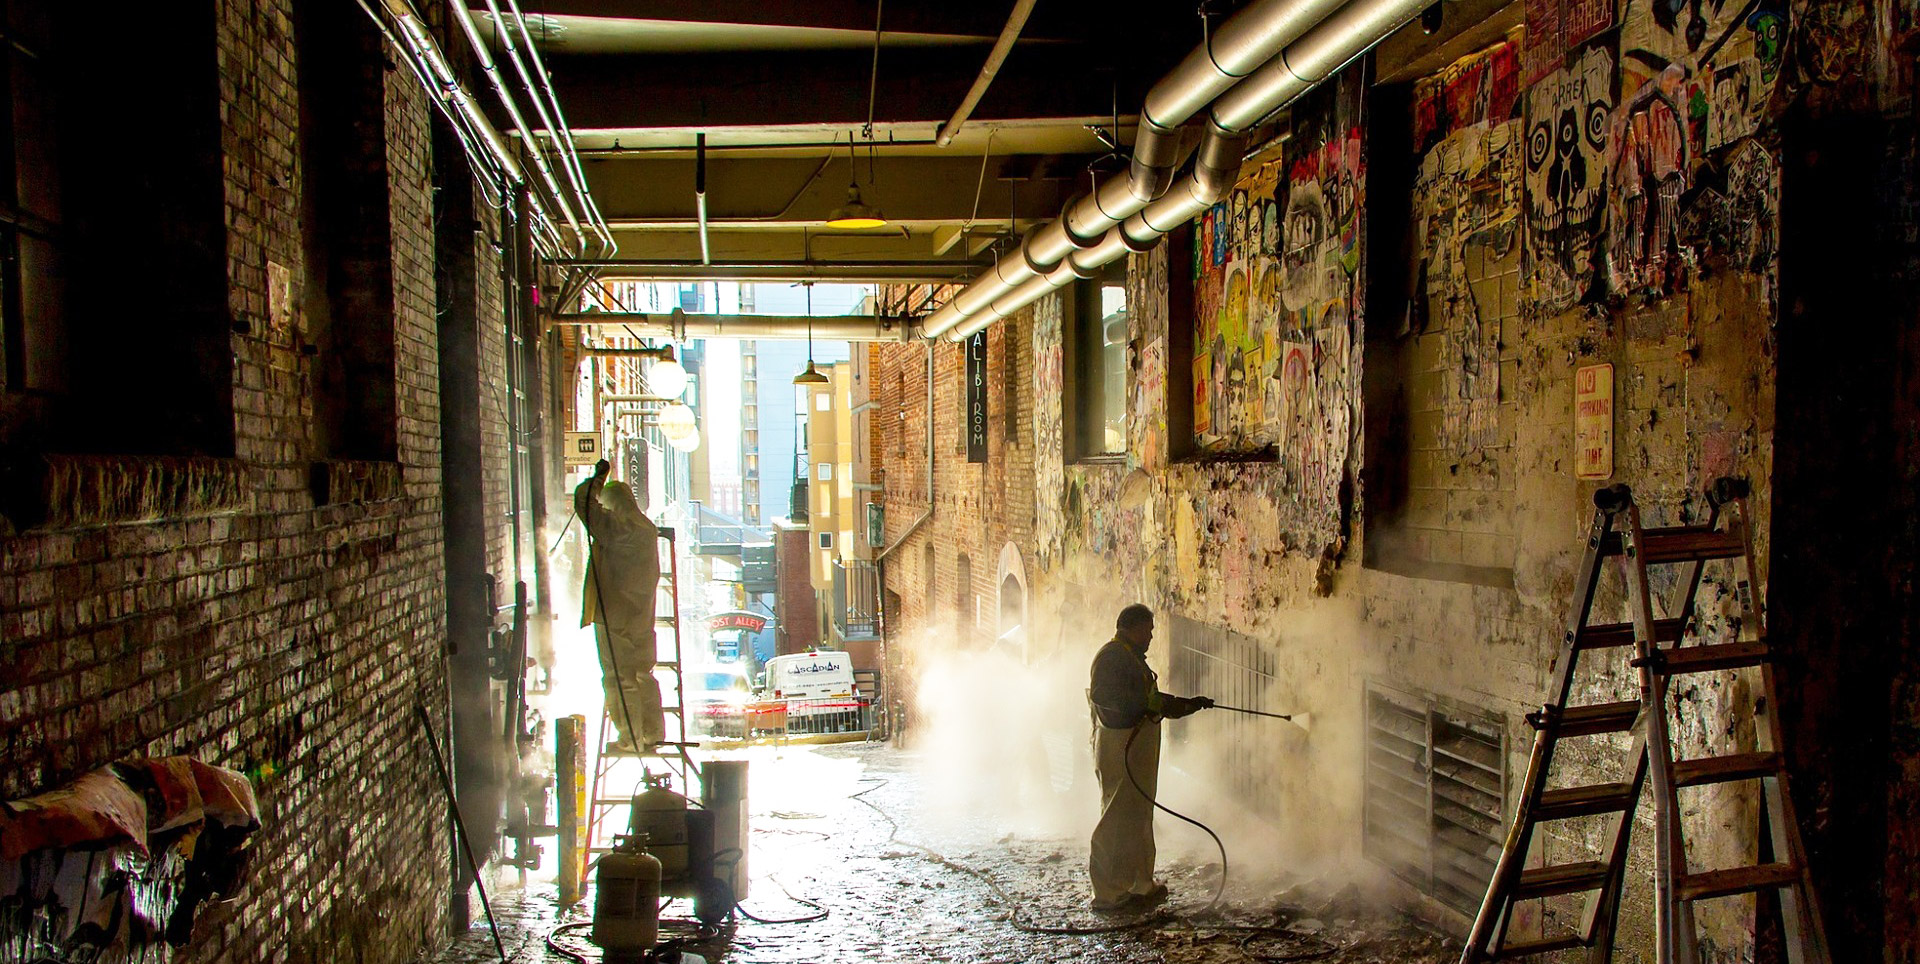 Hard Surface Graffiti Cleaning